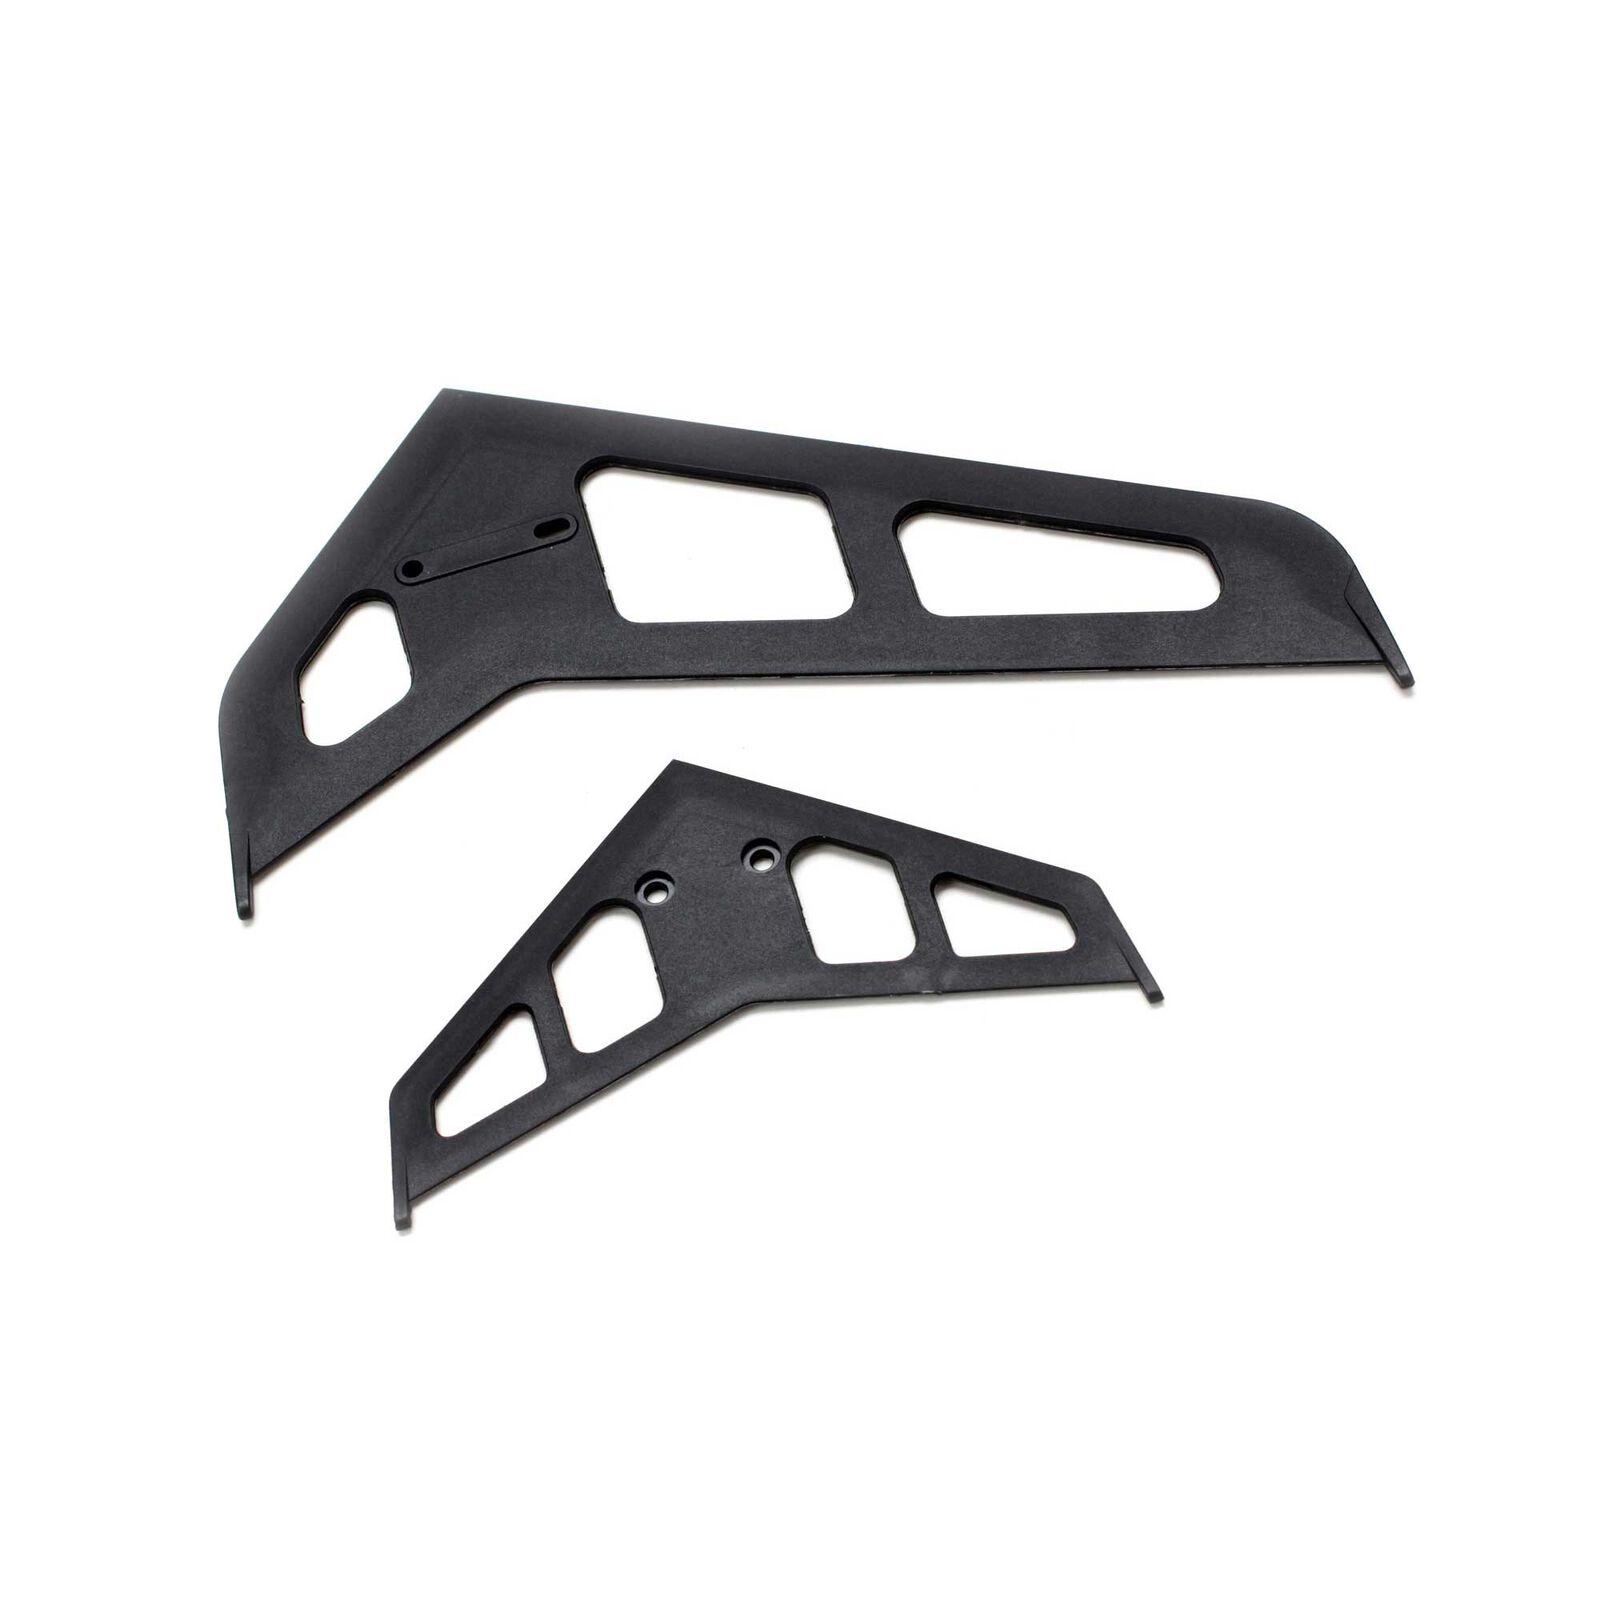 Stabilizer Fin Set Black: B500 3D/X